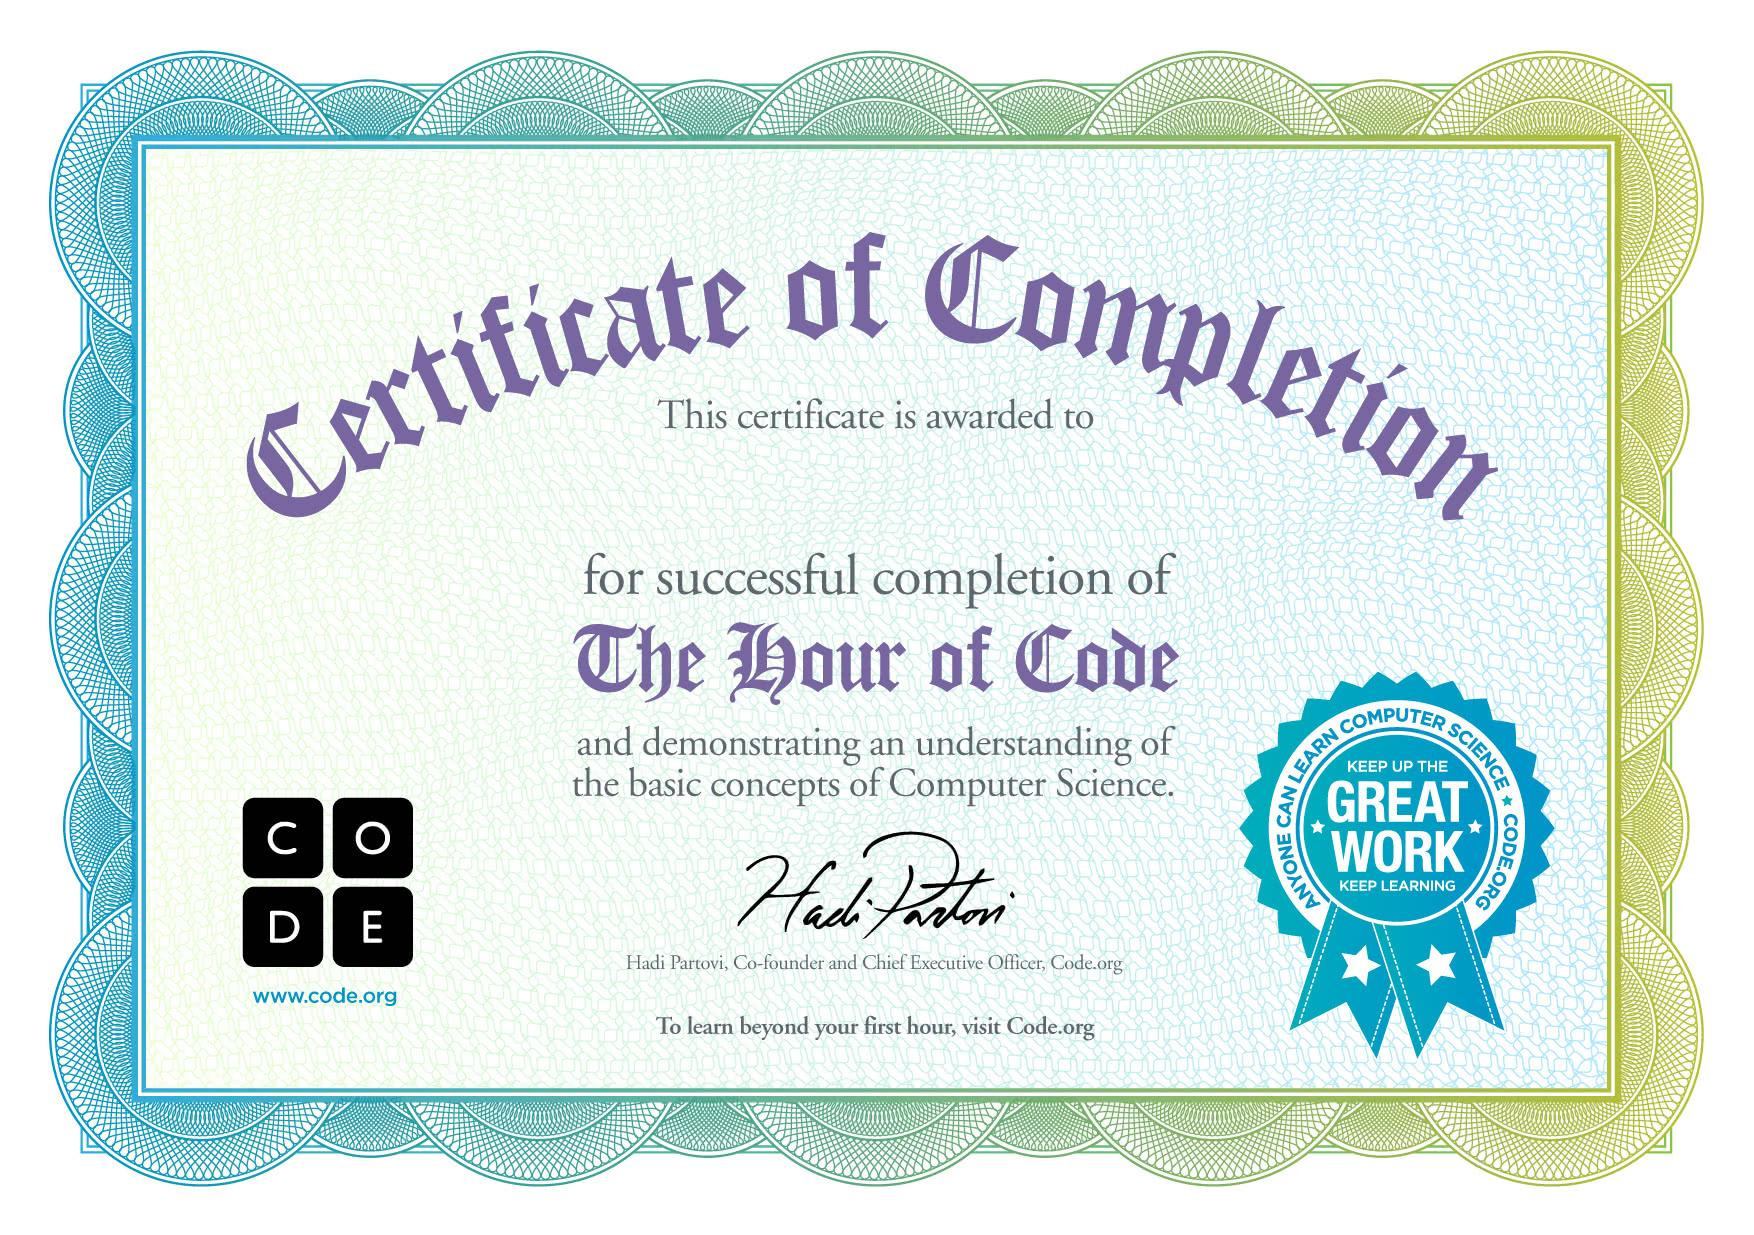 06/05/20 - Hour of Code